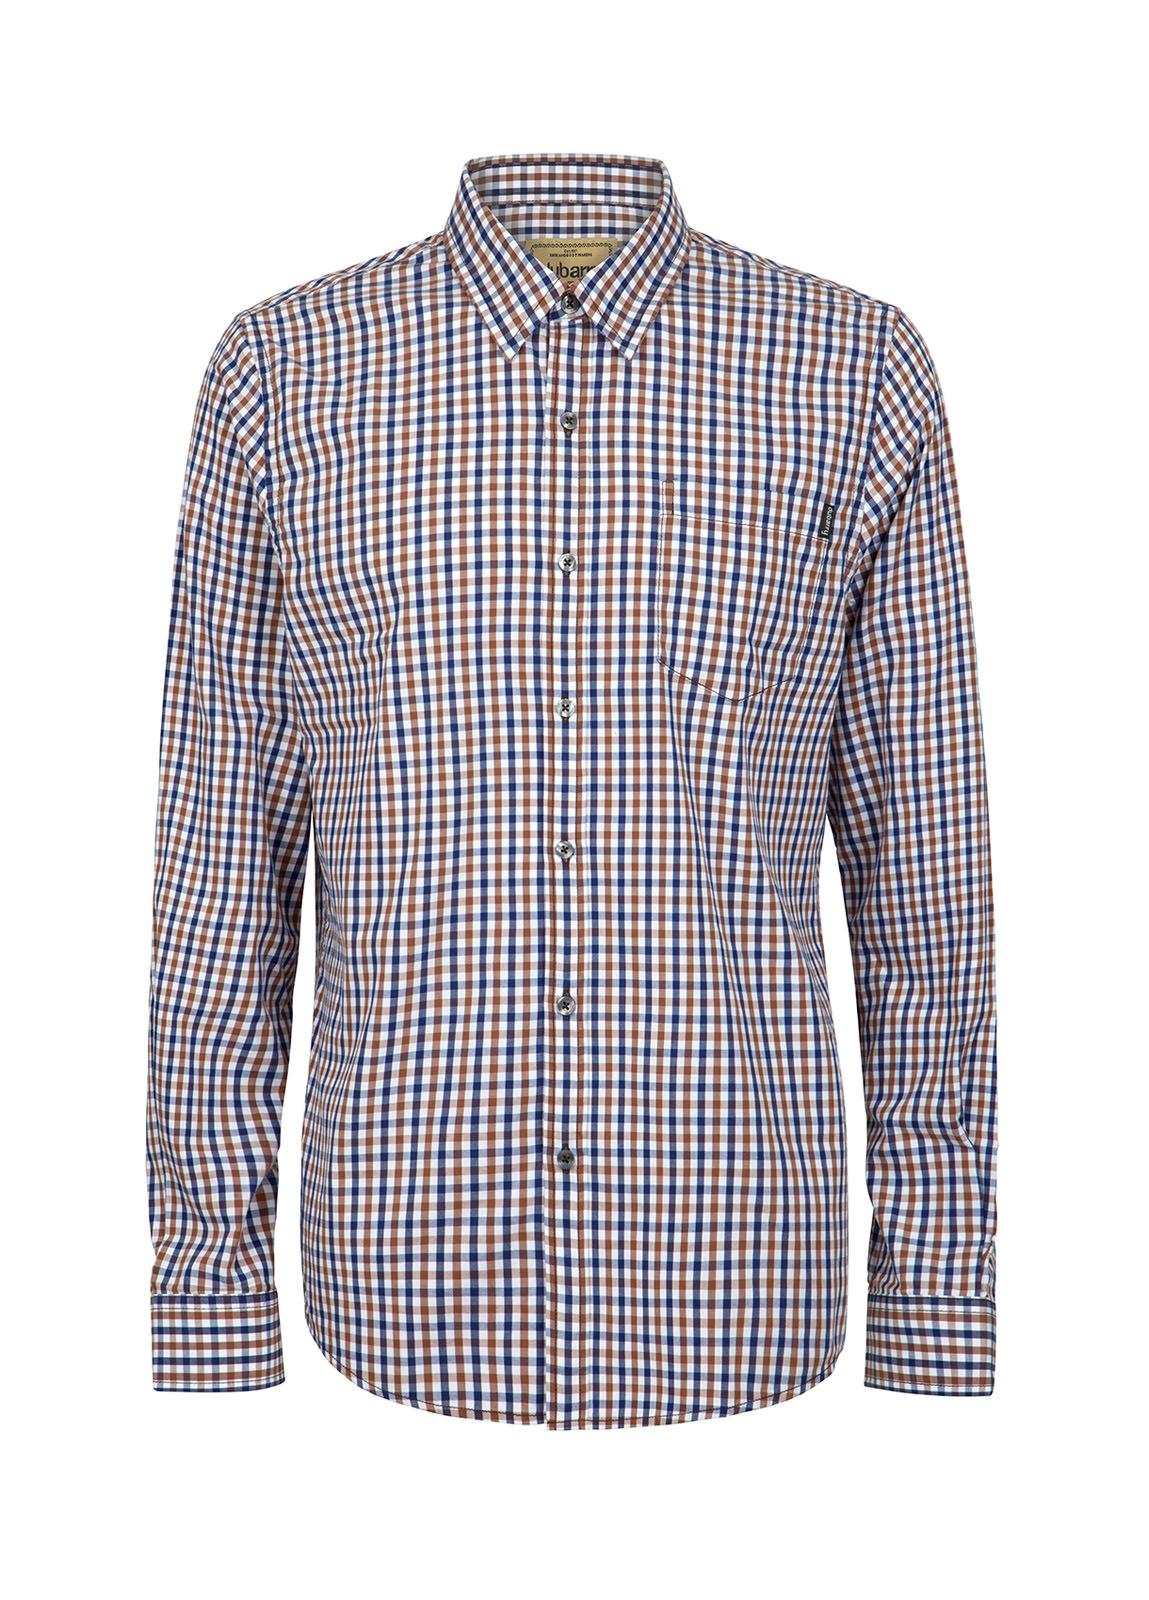 Dubarry_ Allenwood Men's Shirt - Brown Multi_Image_2